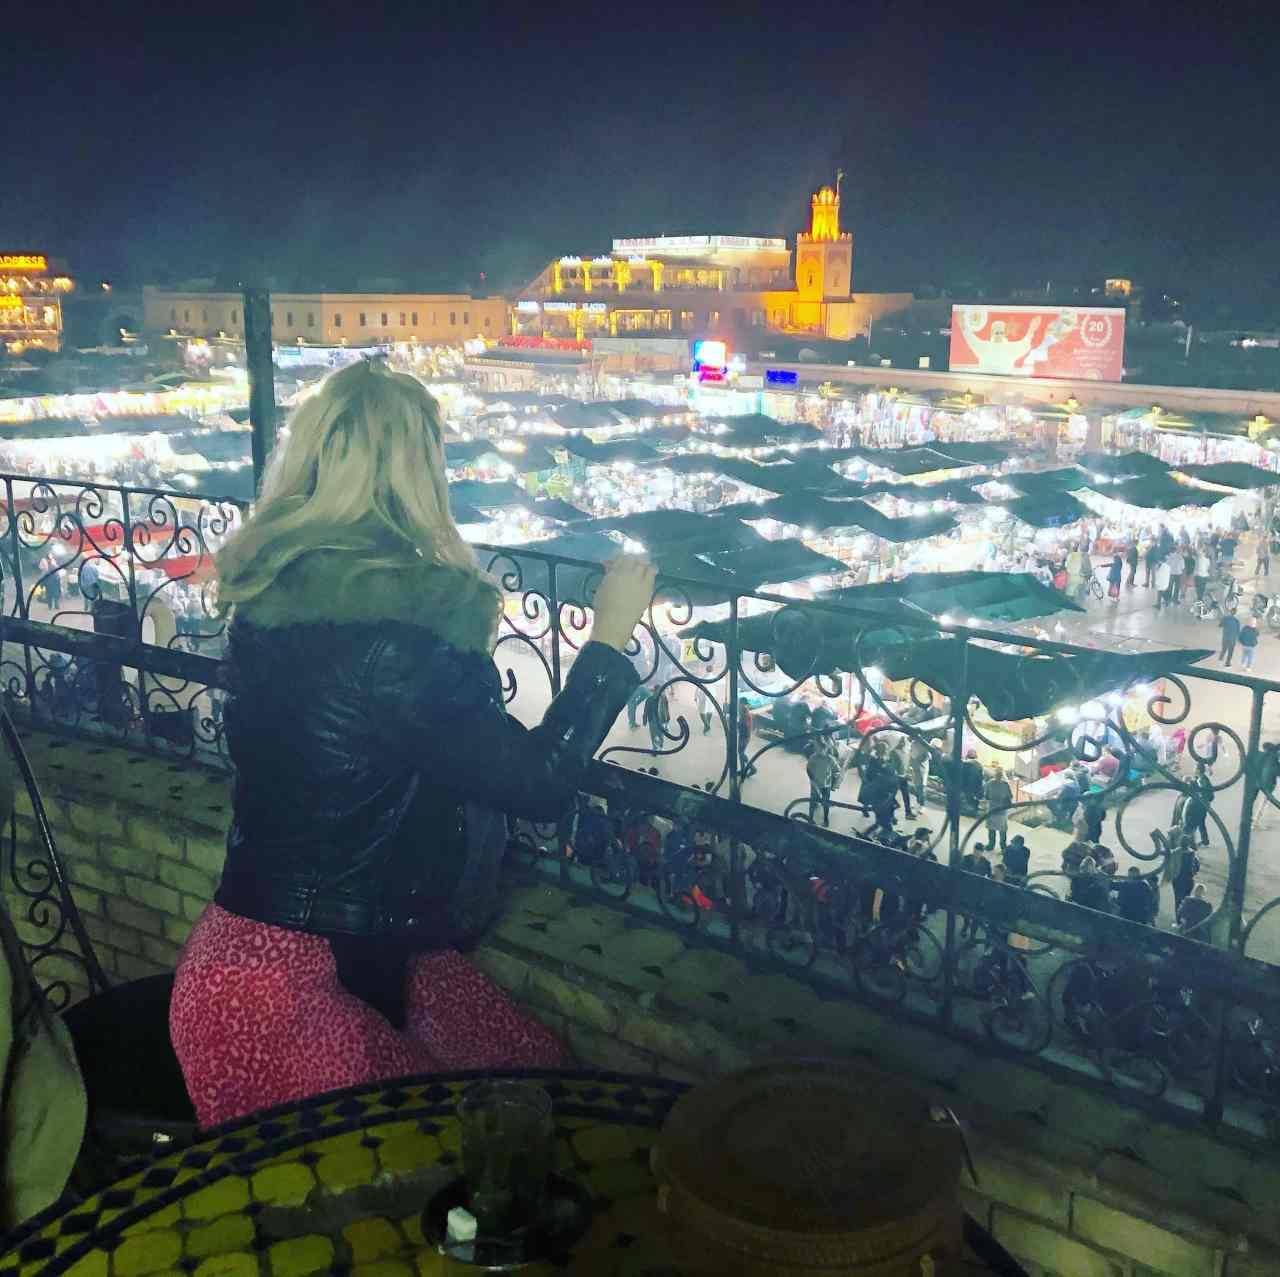 Marrakech main square at night